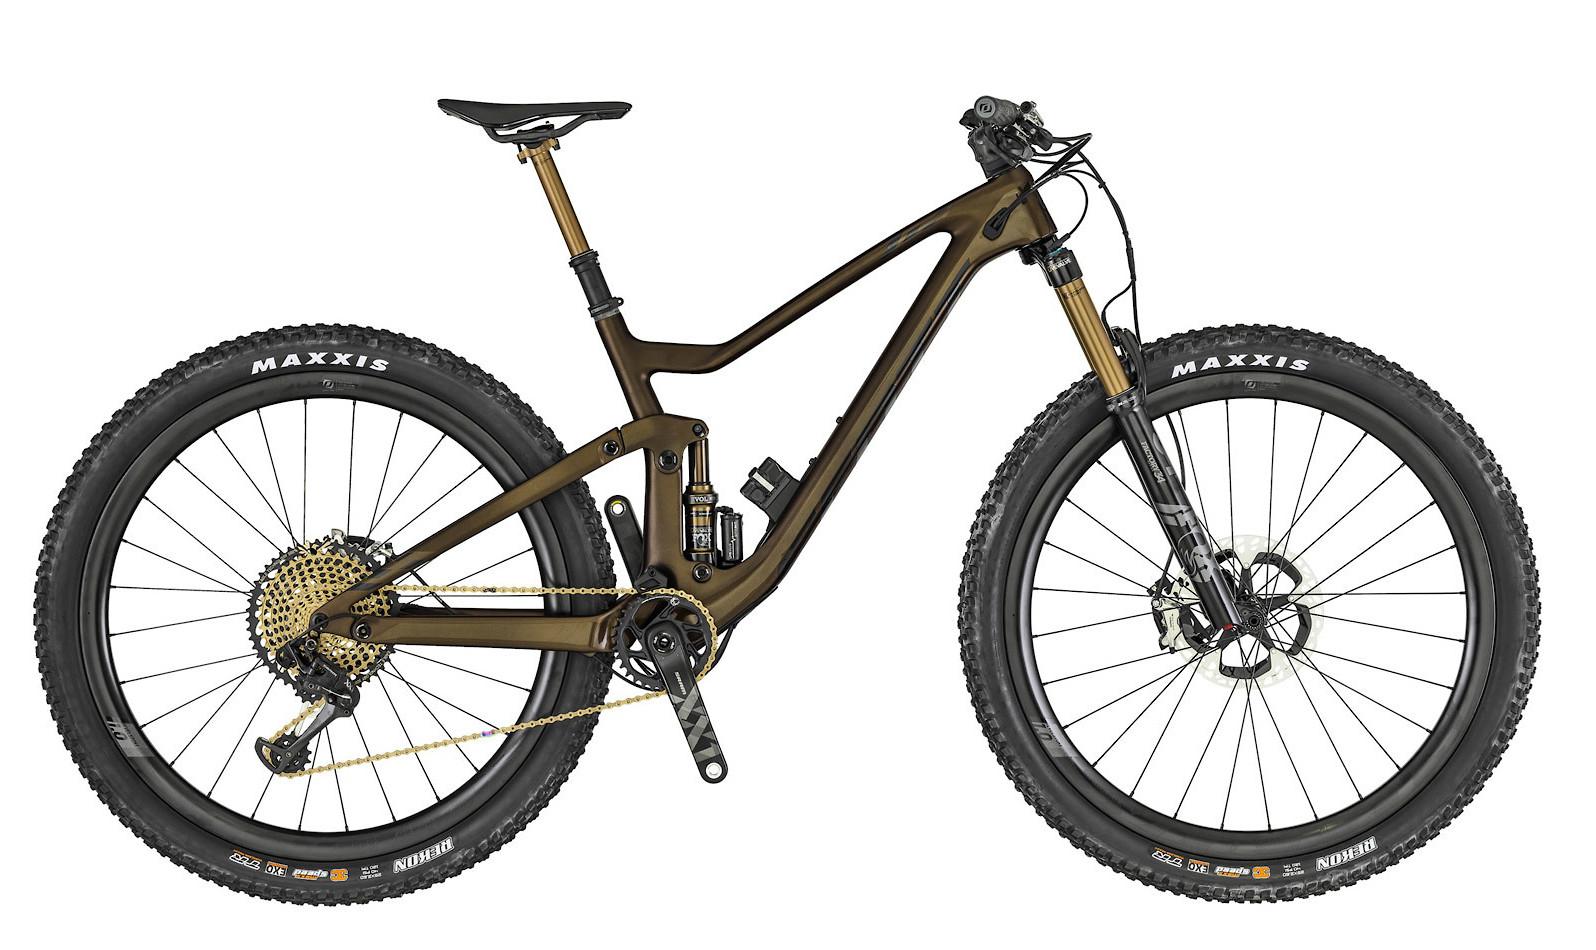 2019 Scott Genius 900 Ultimate Bike